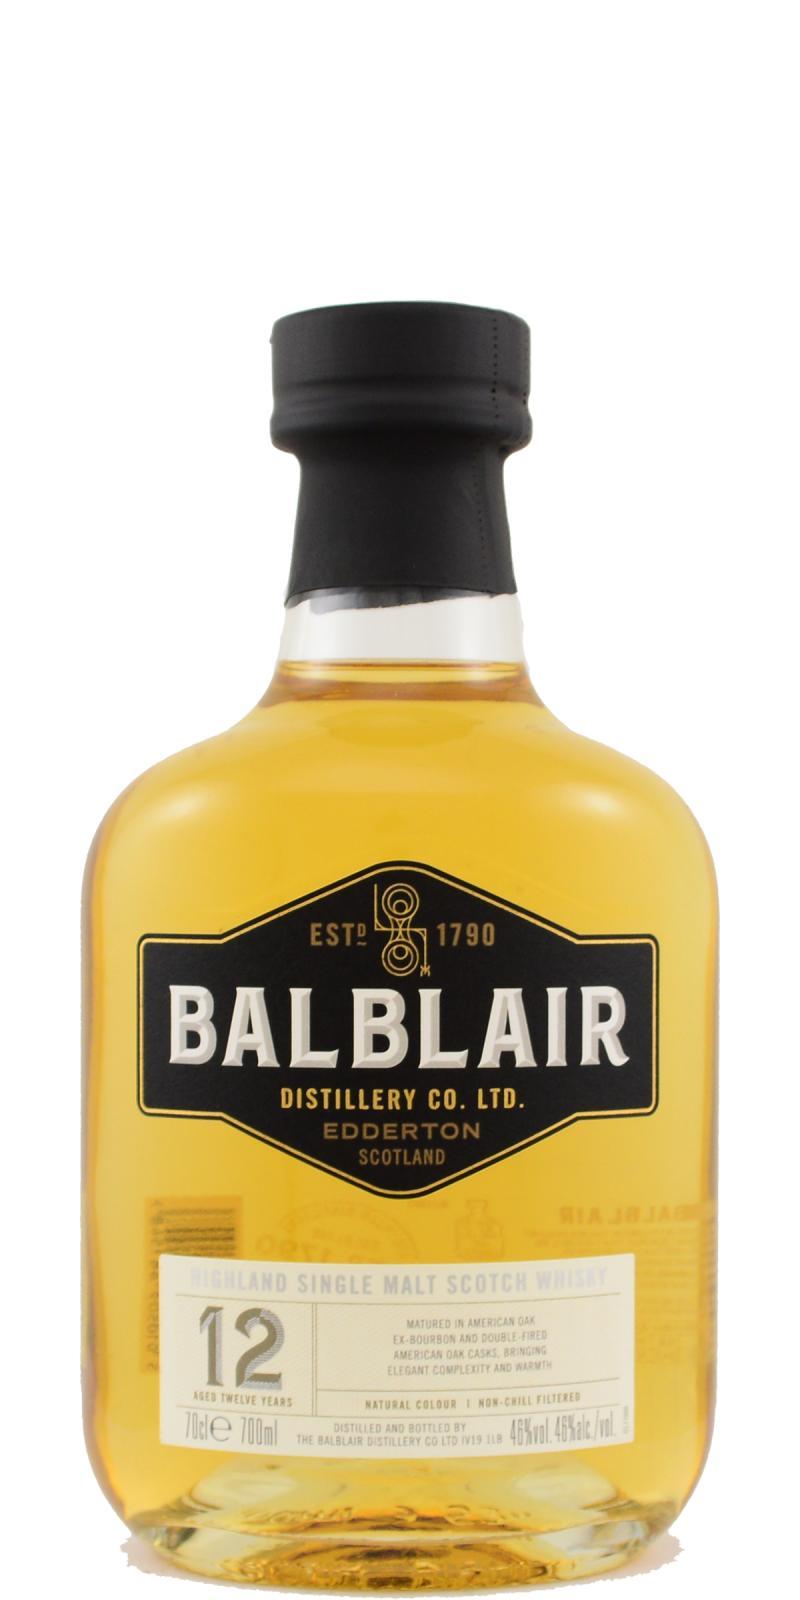 Balblair 12-year-old